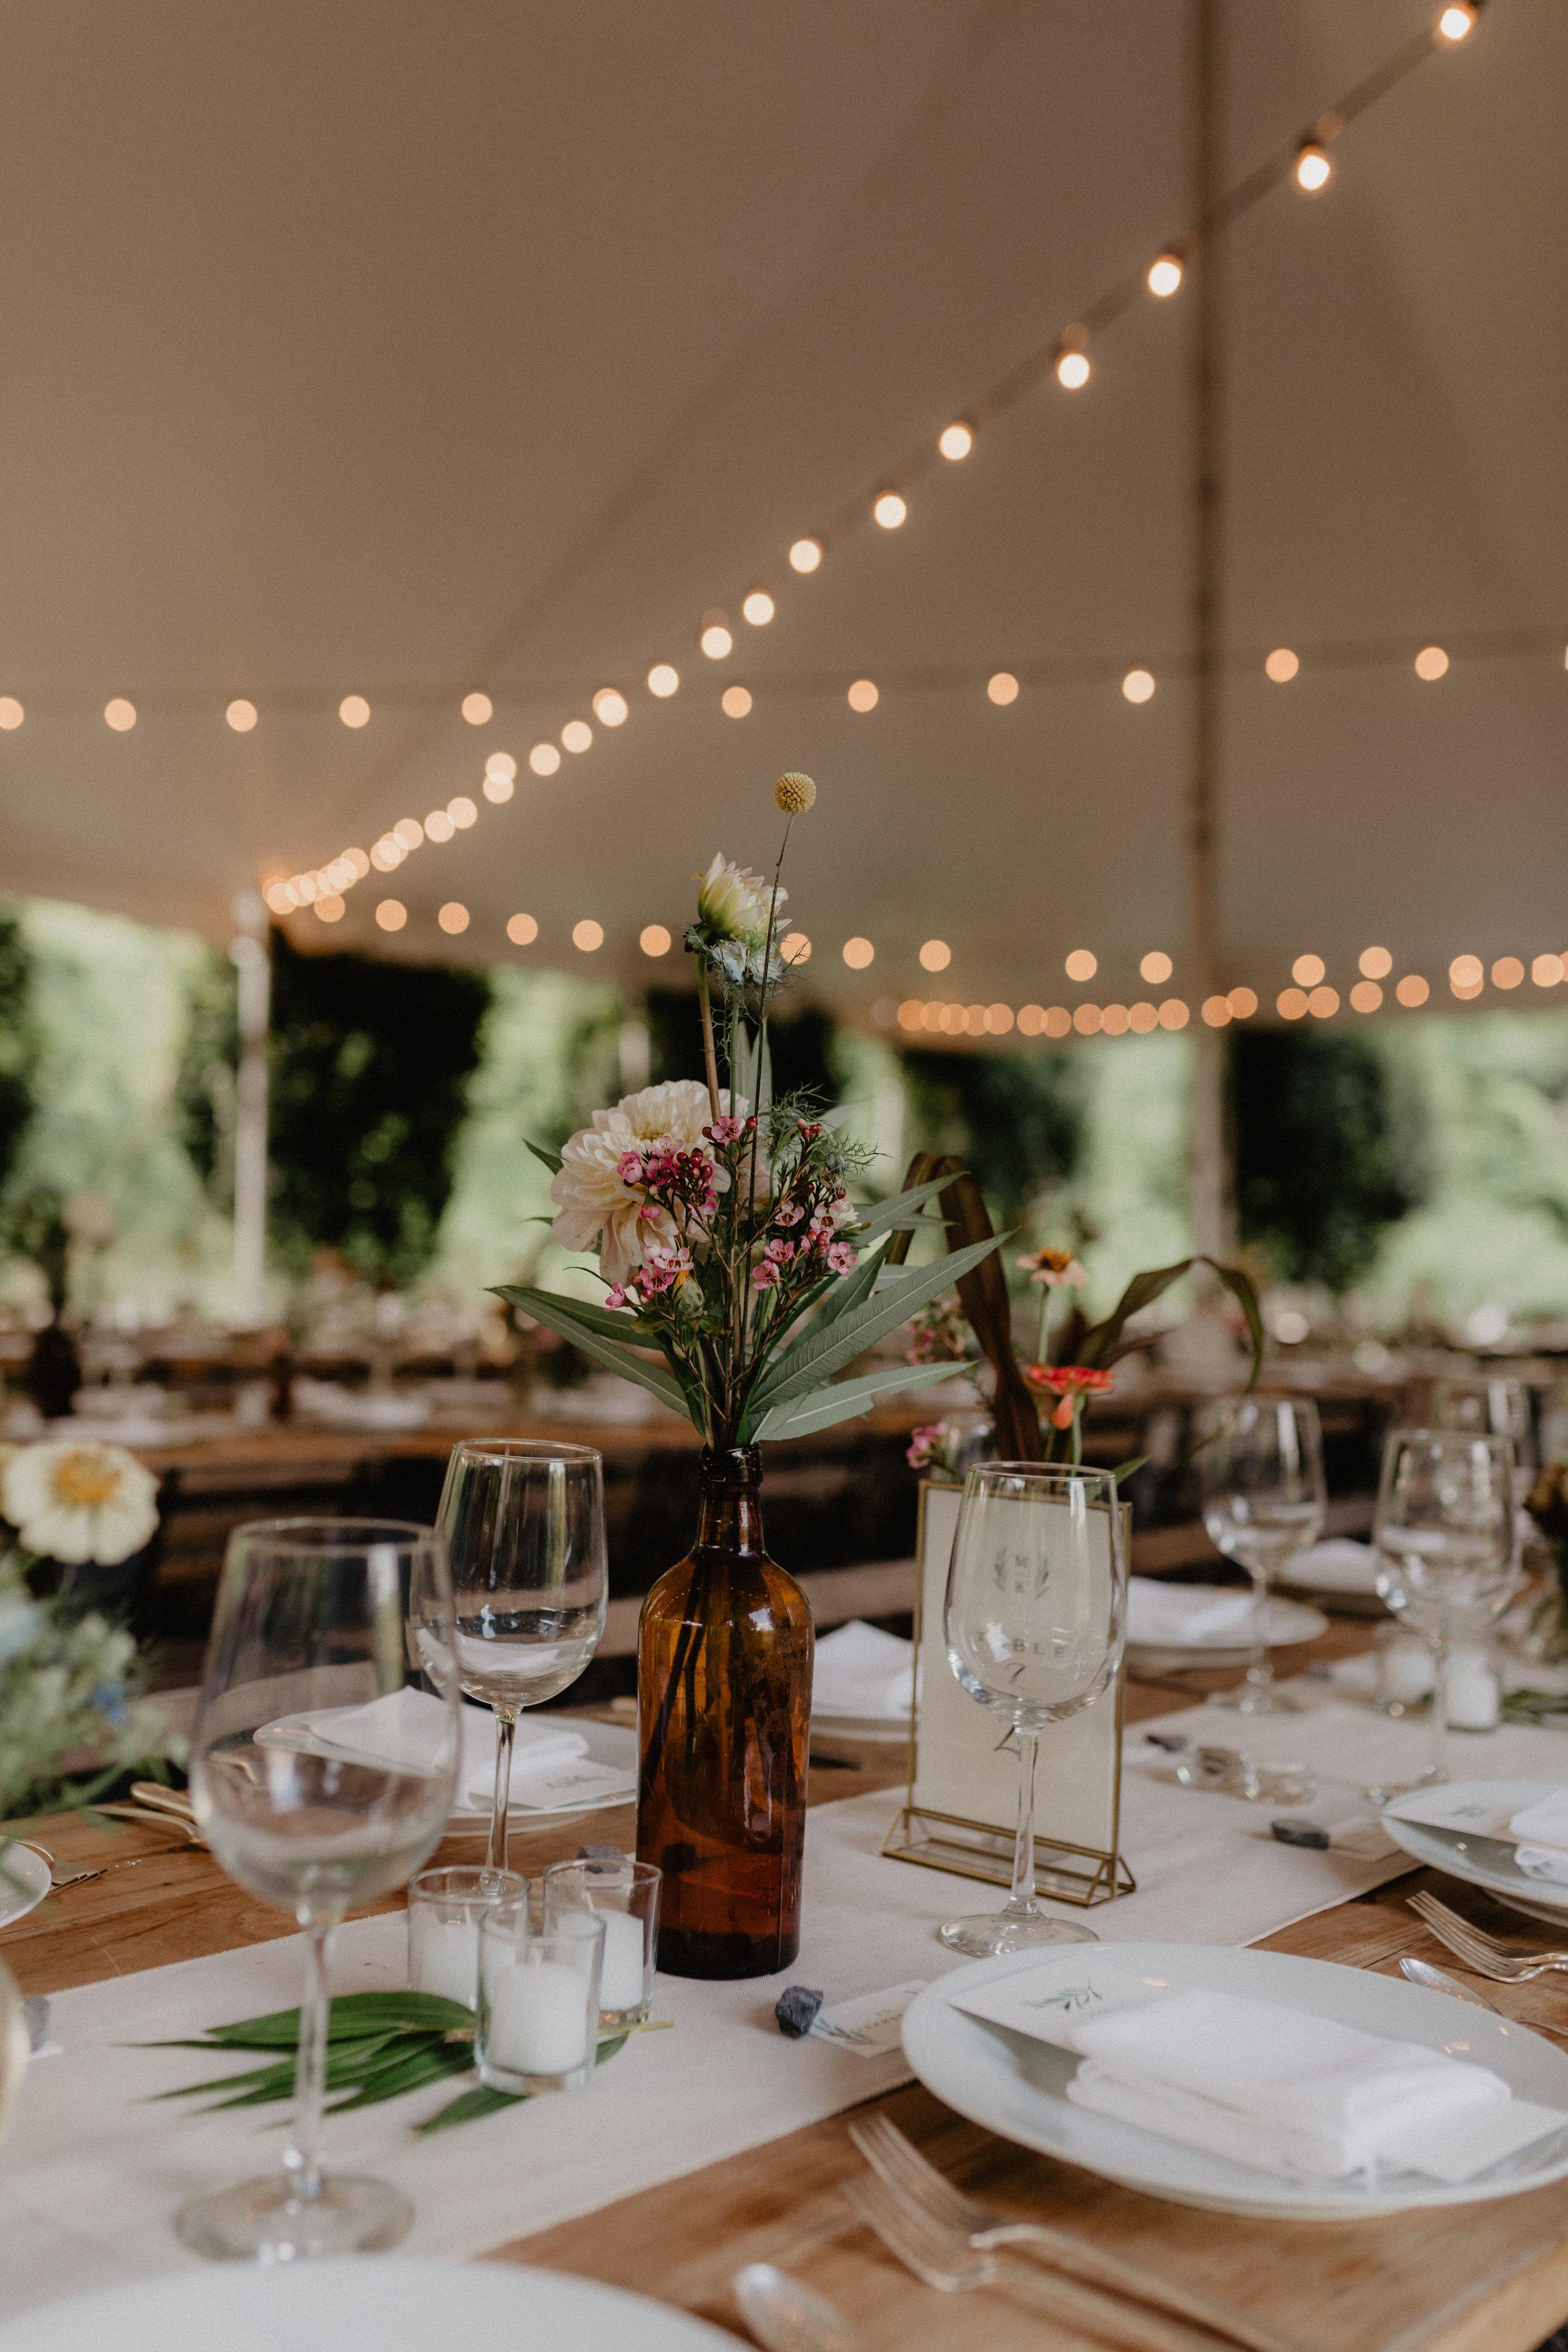 m-and-d-farm-wedding-81.jpg